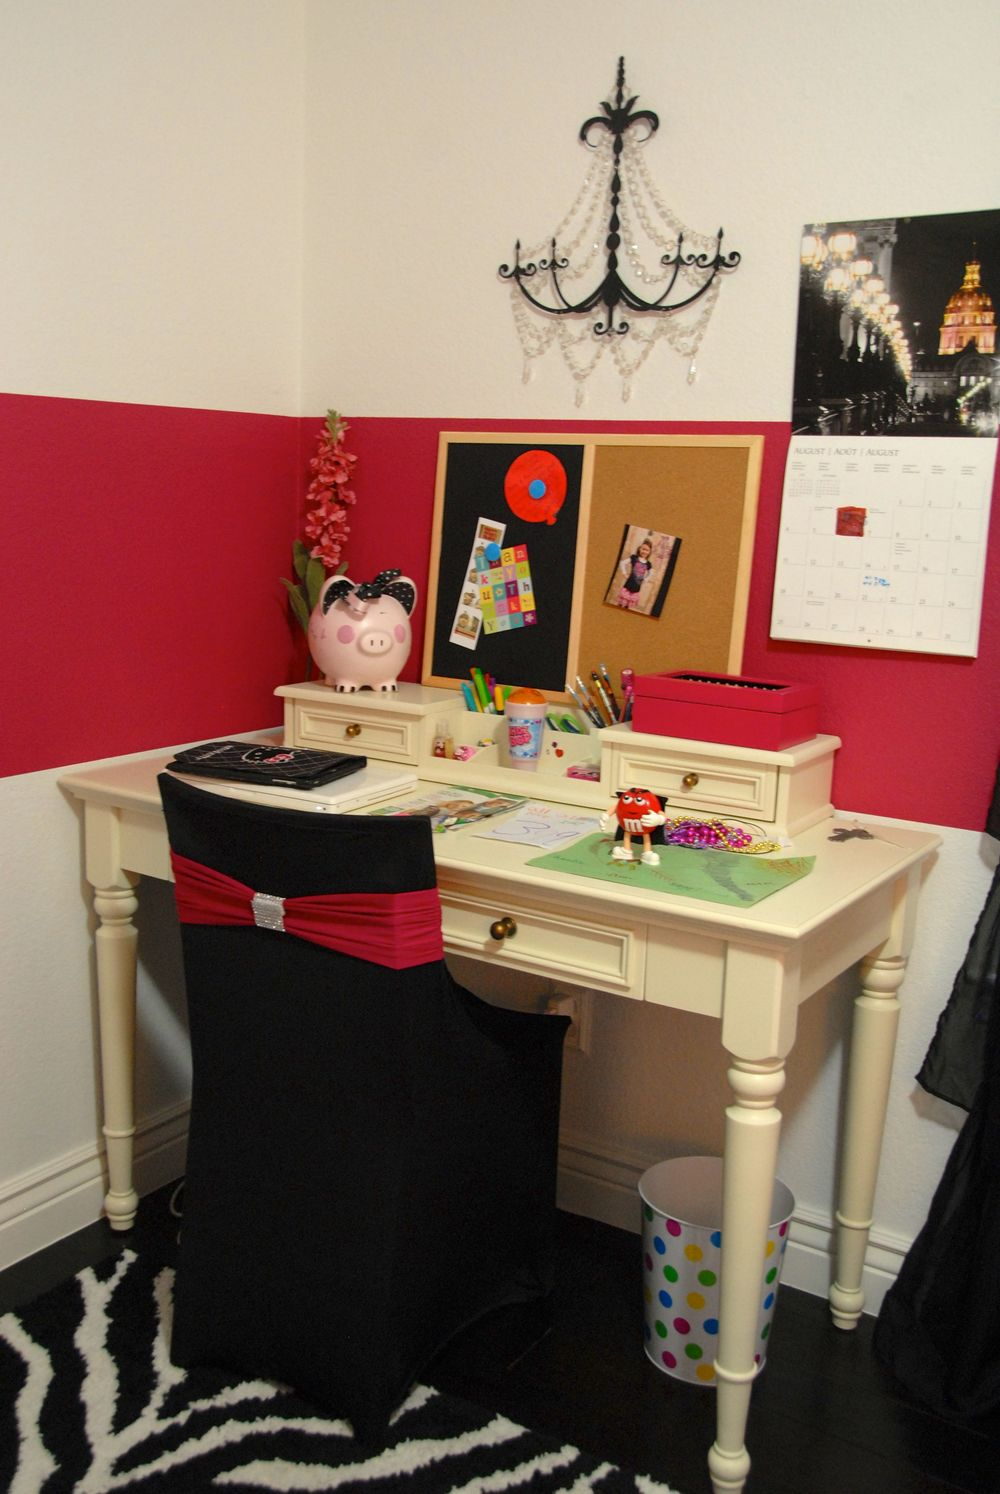 A desk for school work (notice the zebra rug)